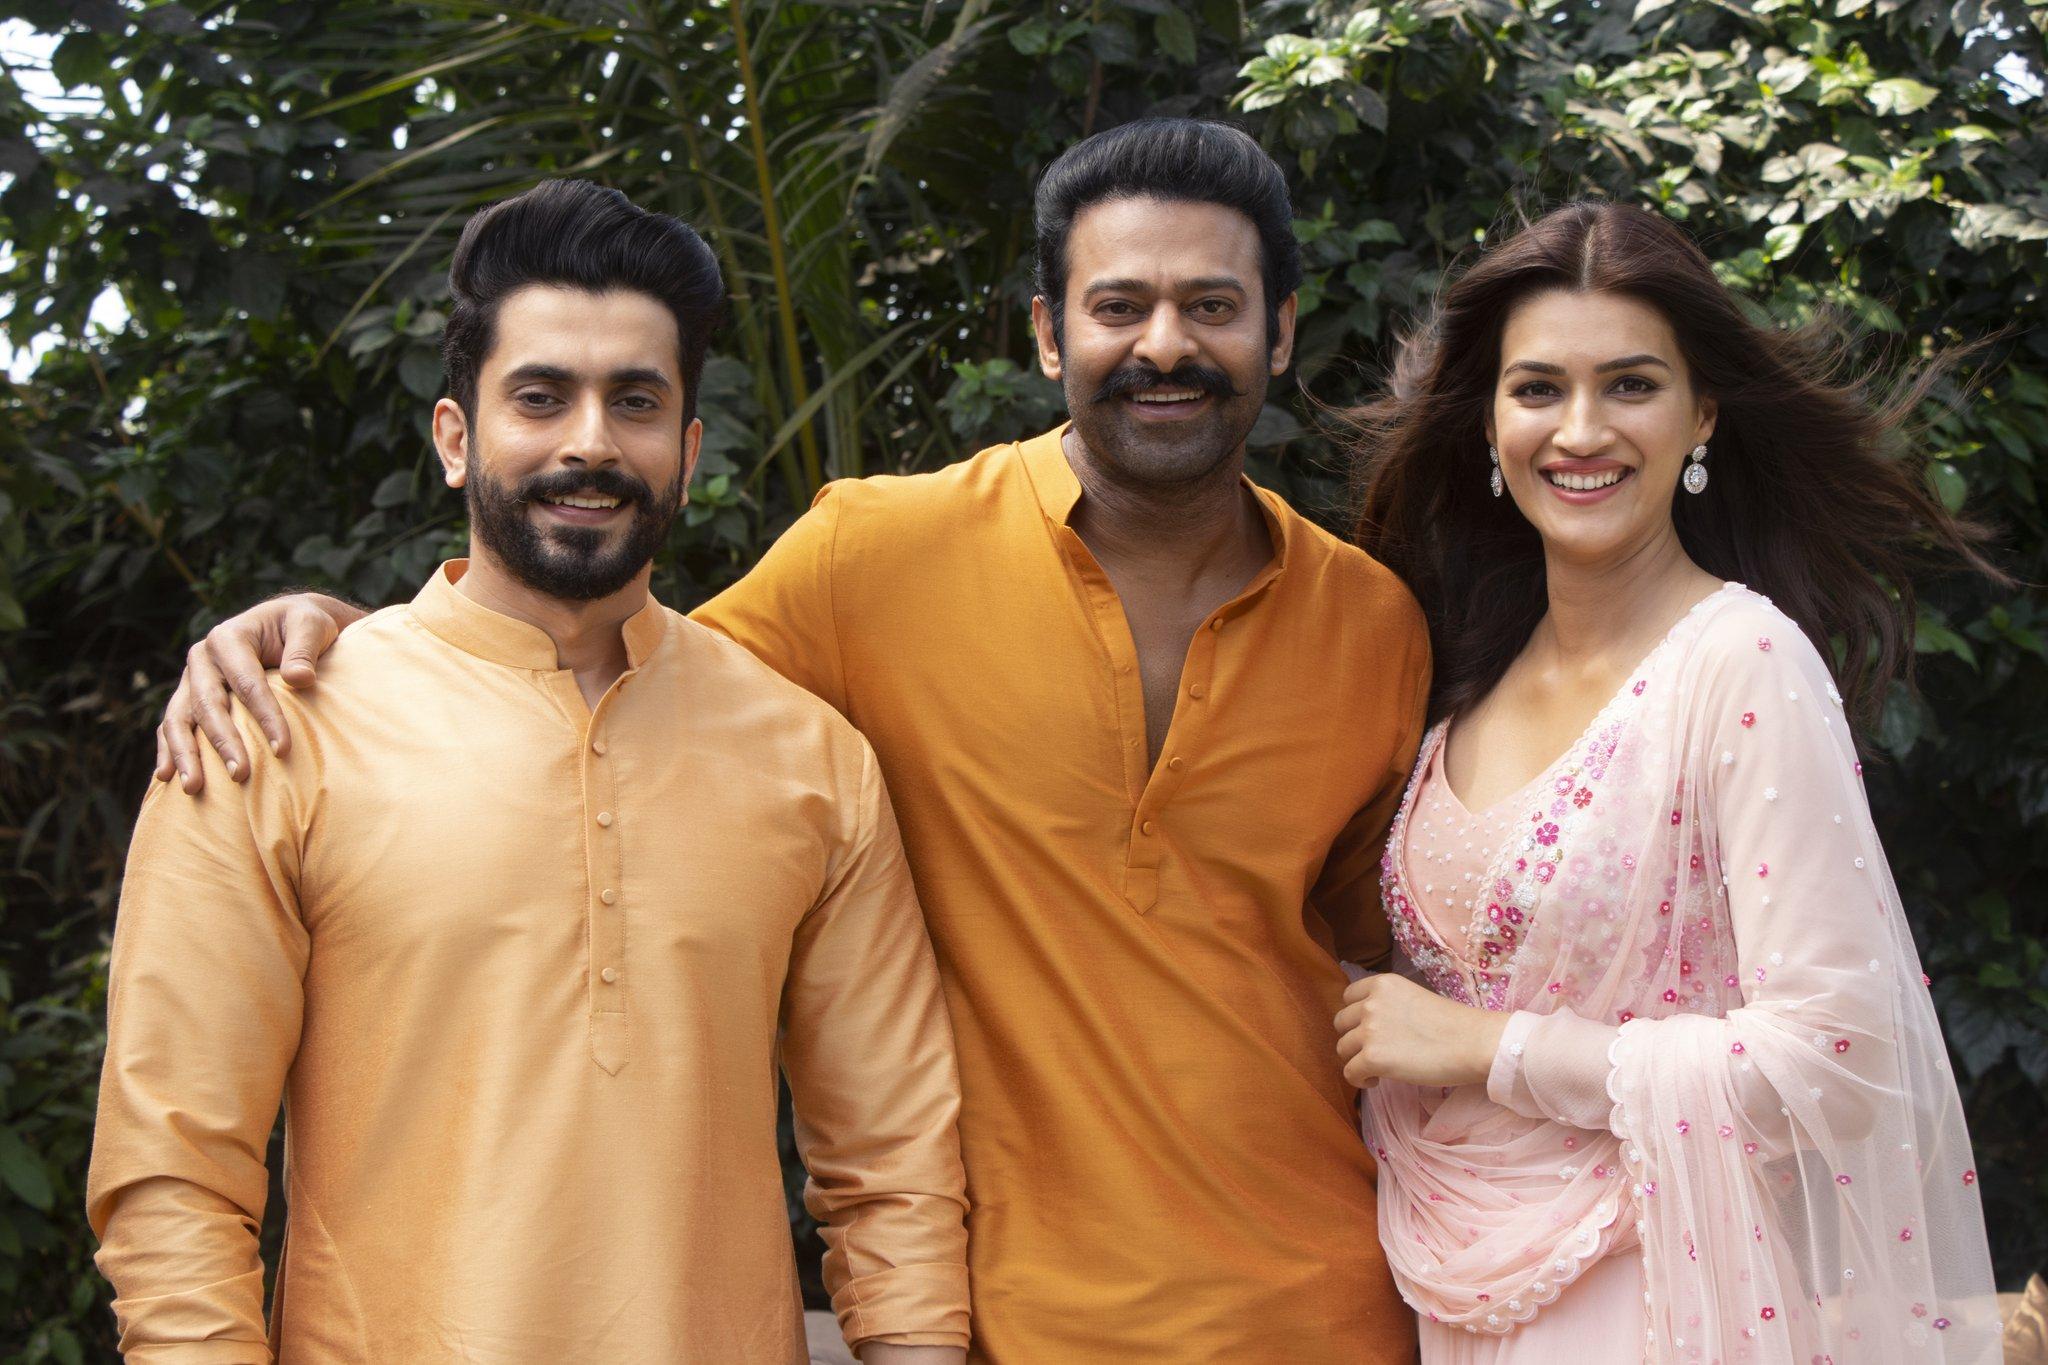 Sunny Singh as Laxman and Kirti Sanon as Sita join the team of Adipurush